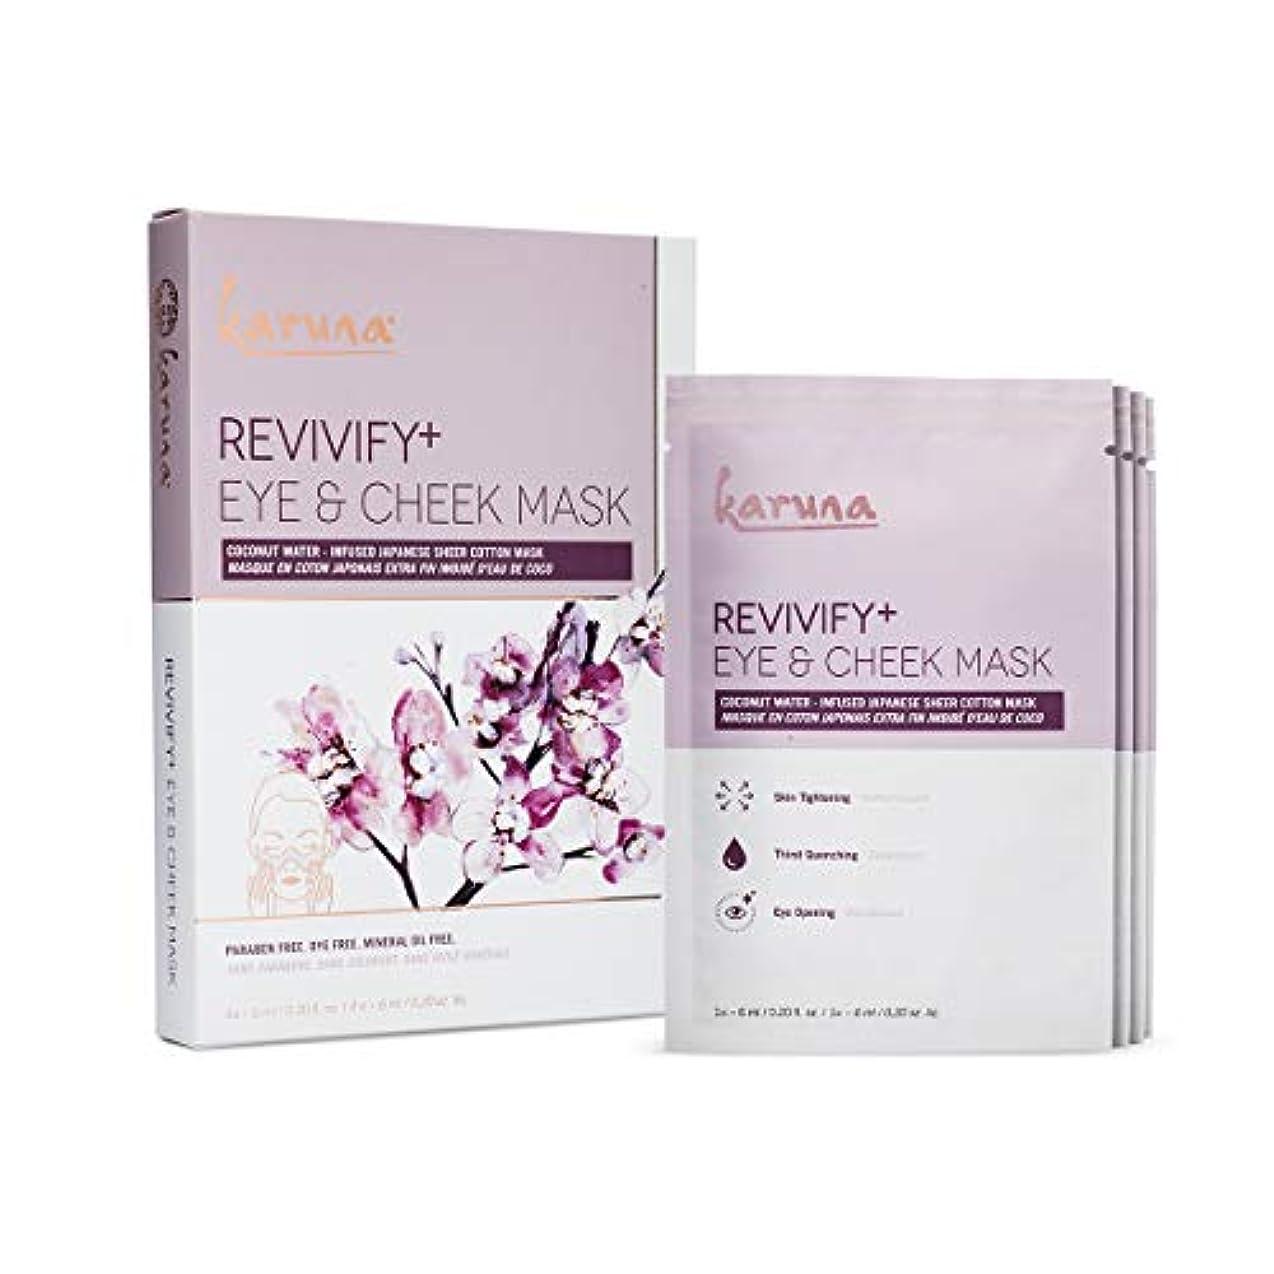 包括的真剣に視力Karuna Revivify+ Eye & Cheek Mask 4sheets並行輸入品